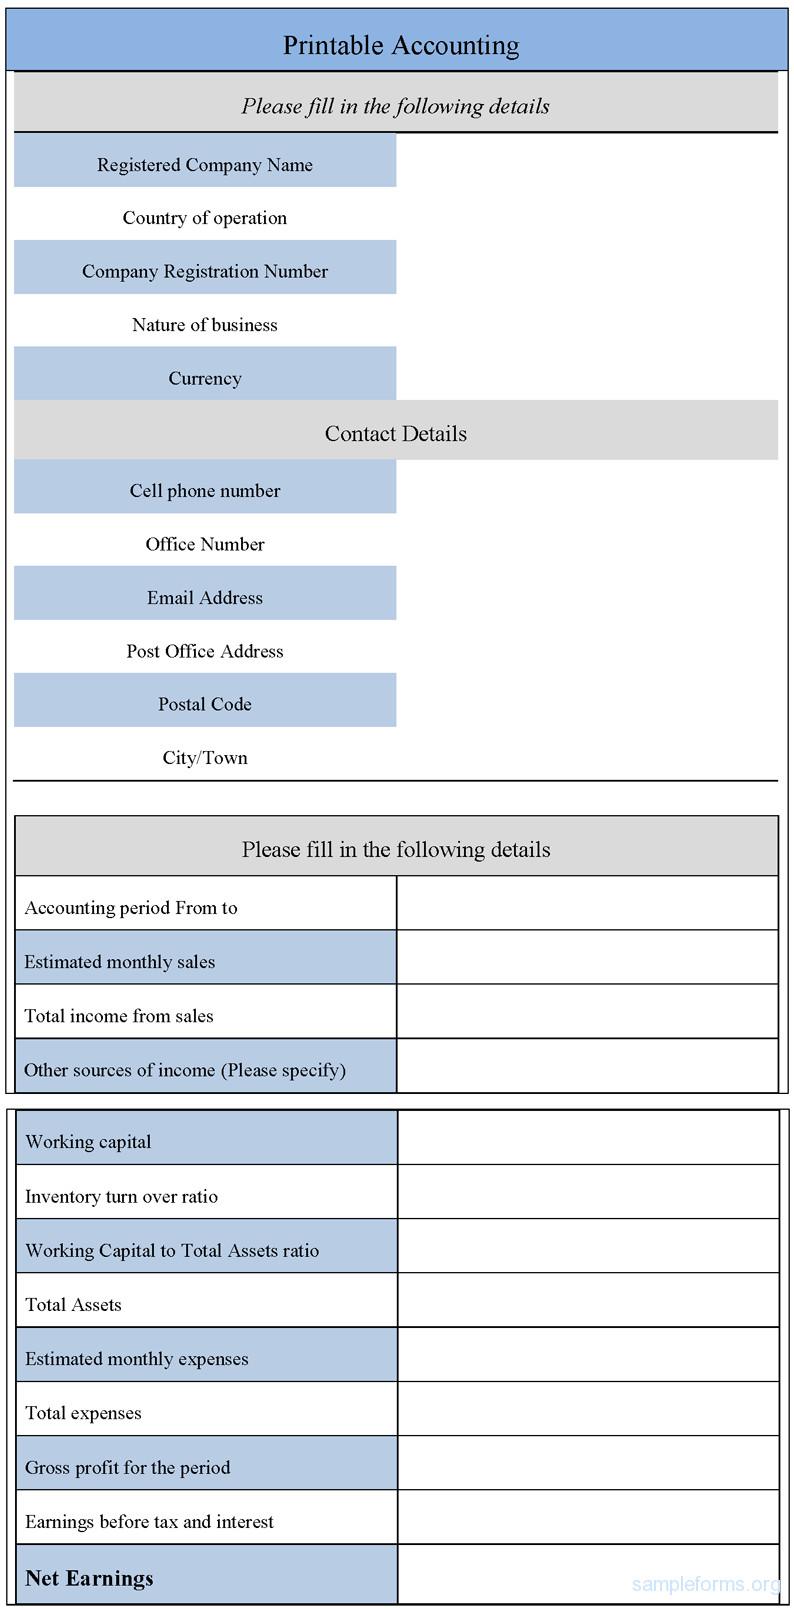 Free Printable Accounting forms Printable Accounting form Sample forms